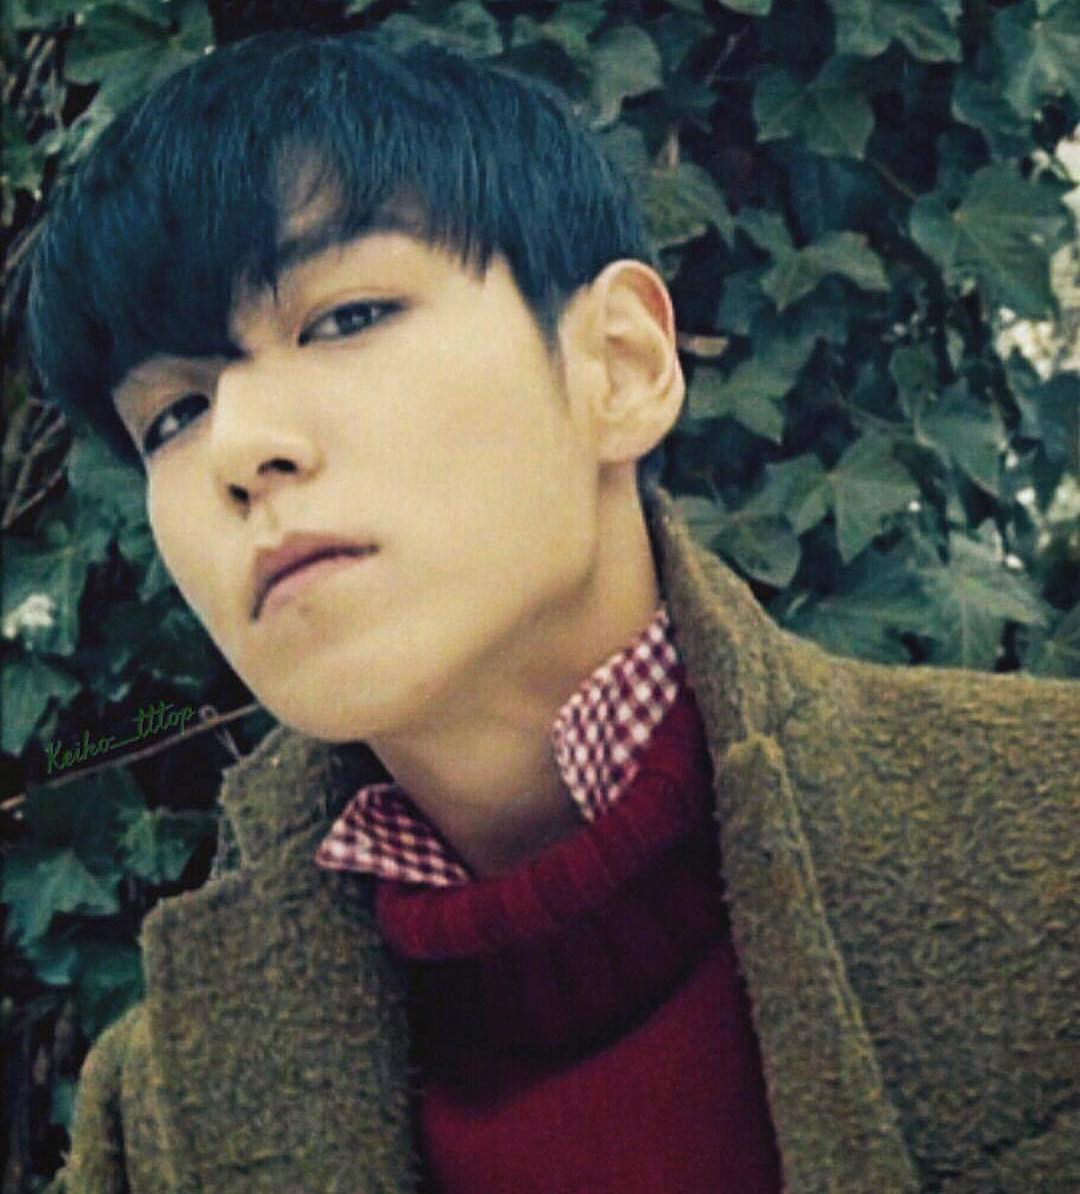 TOP7 BIGBANG TOP IG粉絲人數:8,162,483 平均一天粉絲增加人數 :3,833 平均按讚人數:404,156 平均留言數:21,756